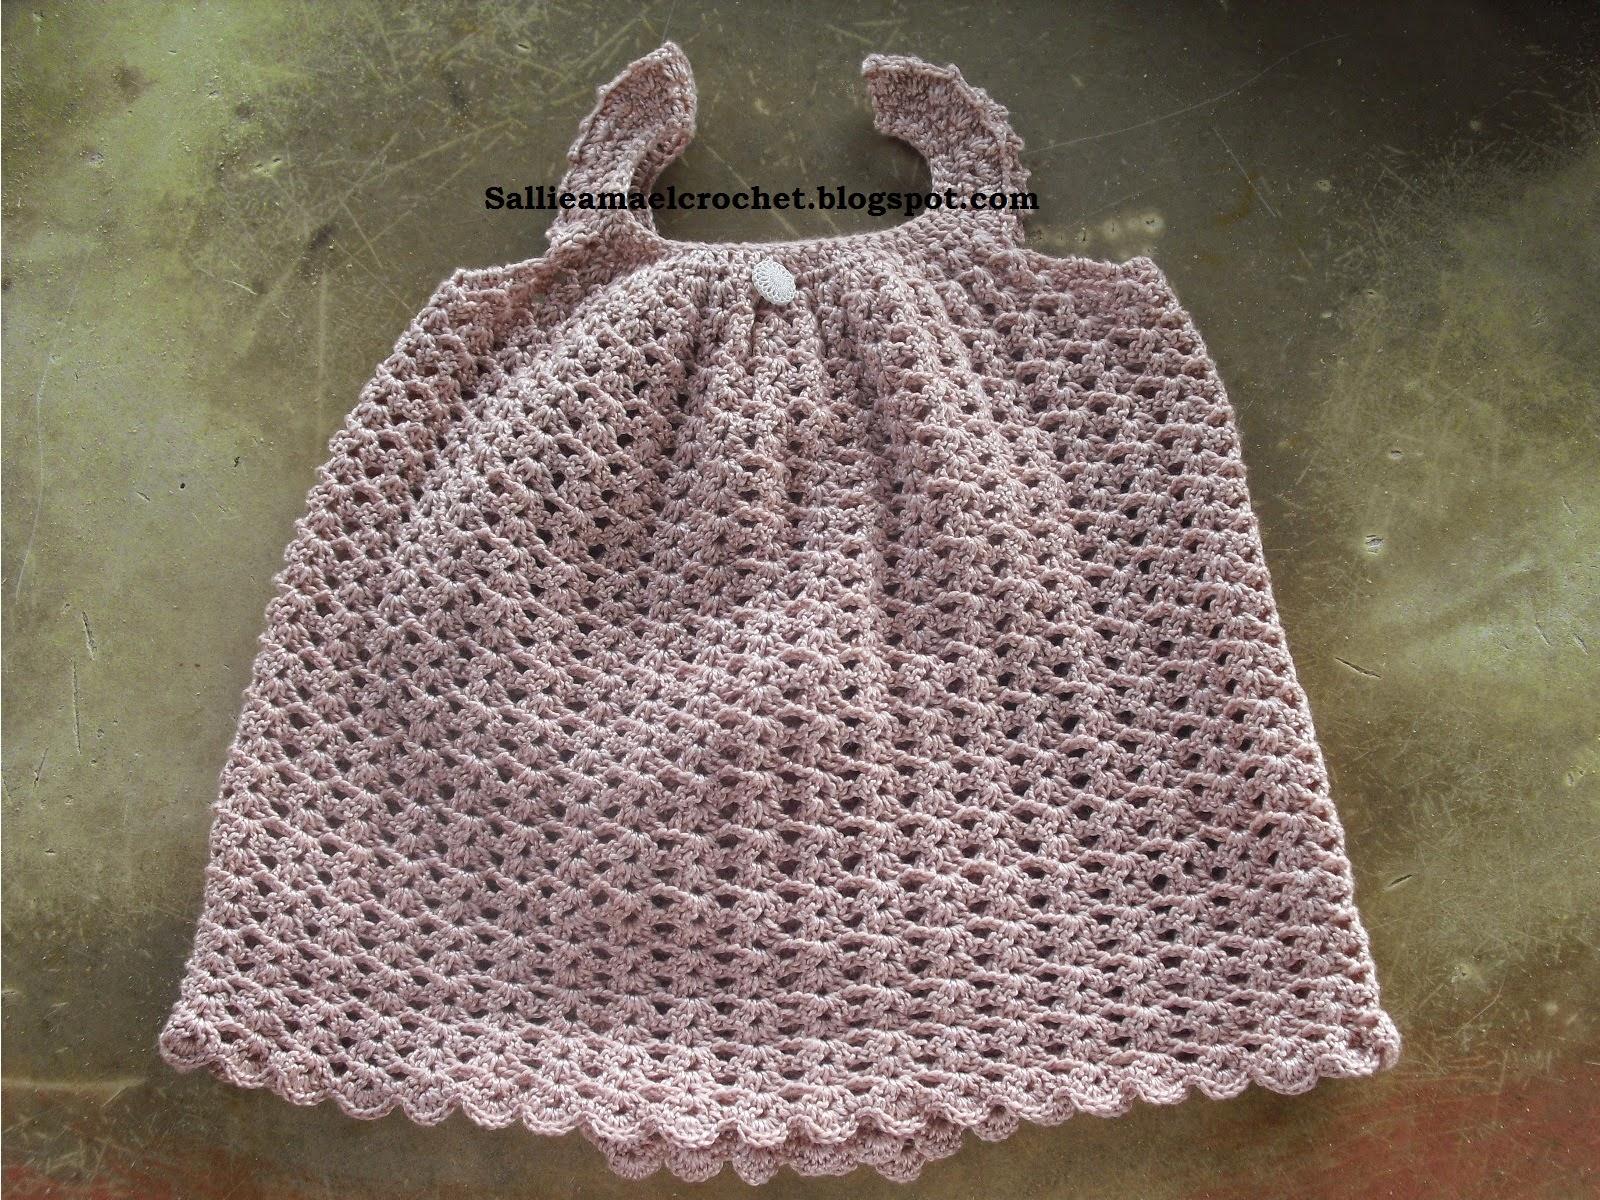 Sallie Ama el Crochet